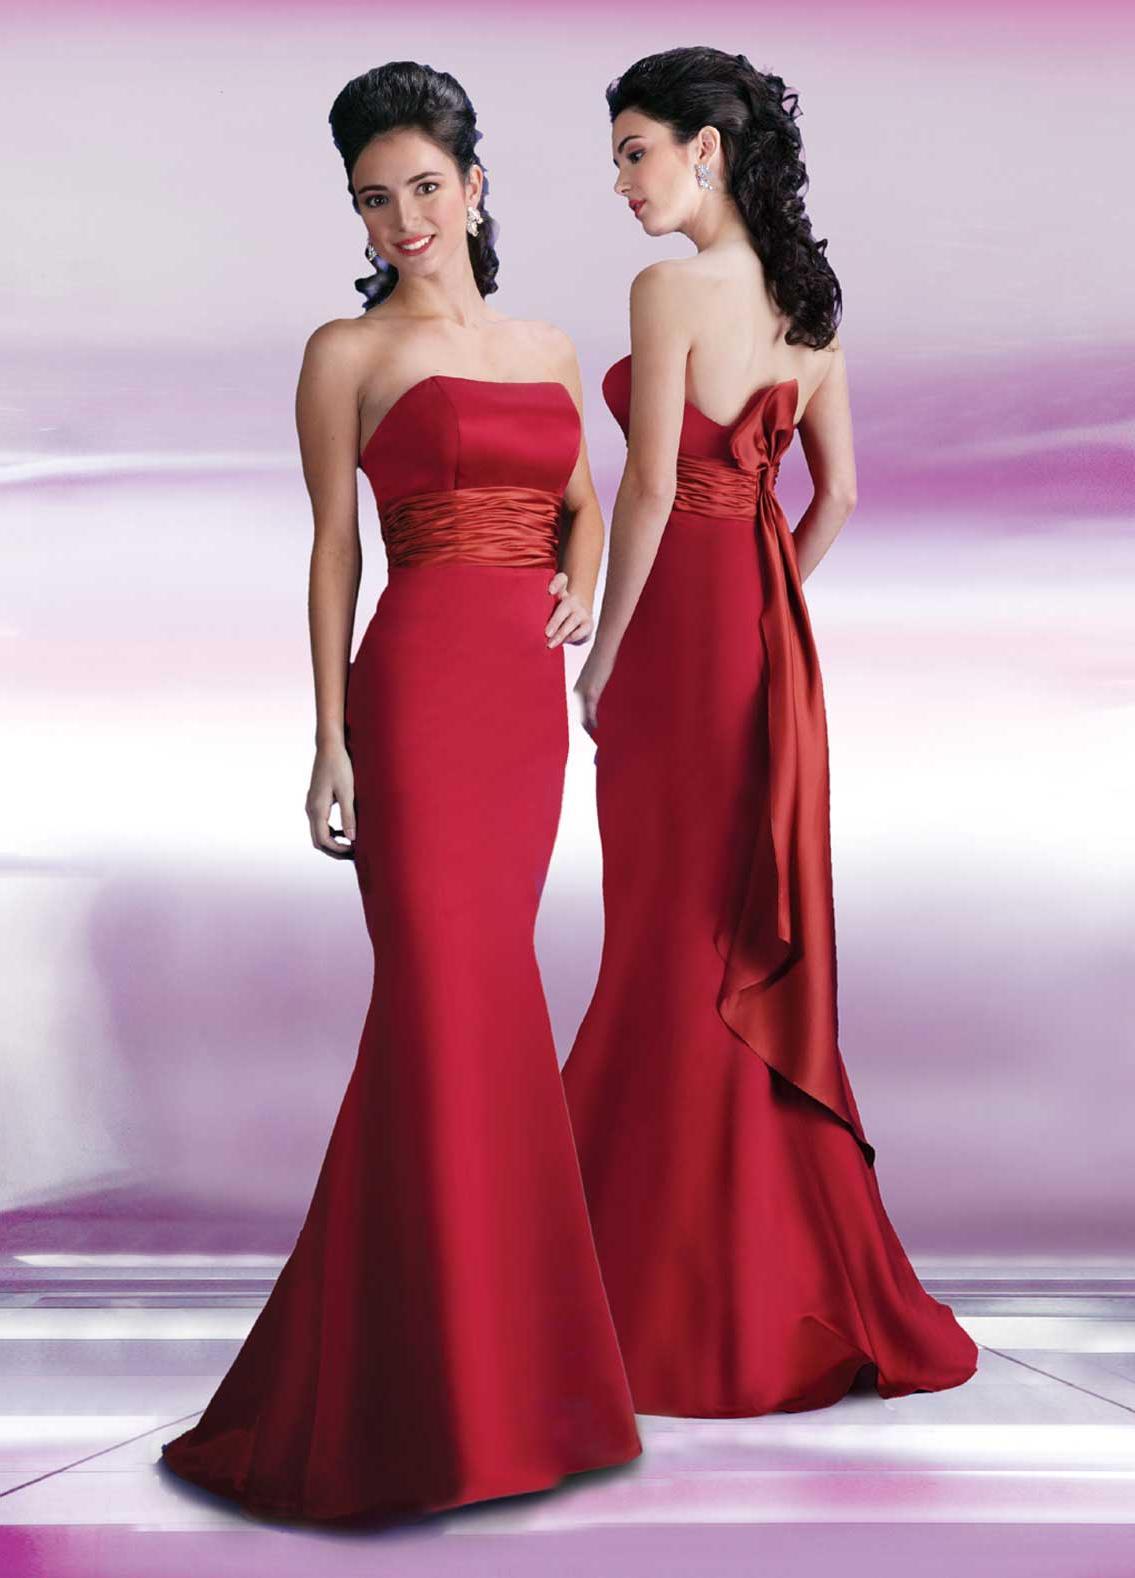 A-line Bridesmaid Dresses-Red